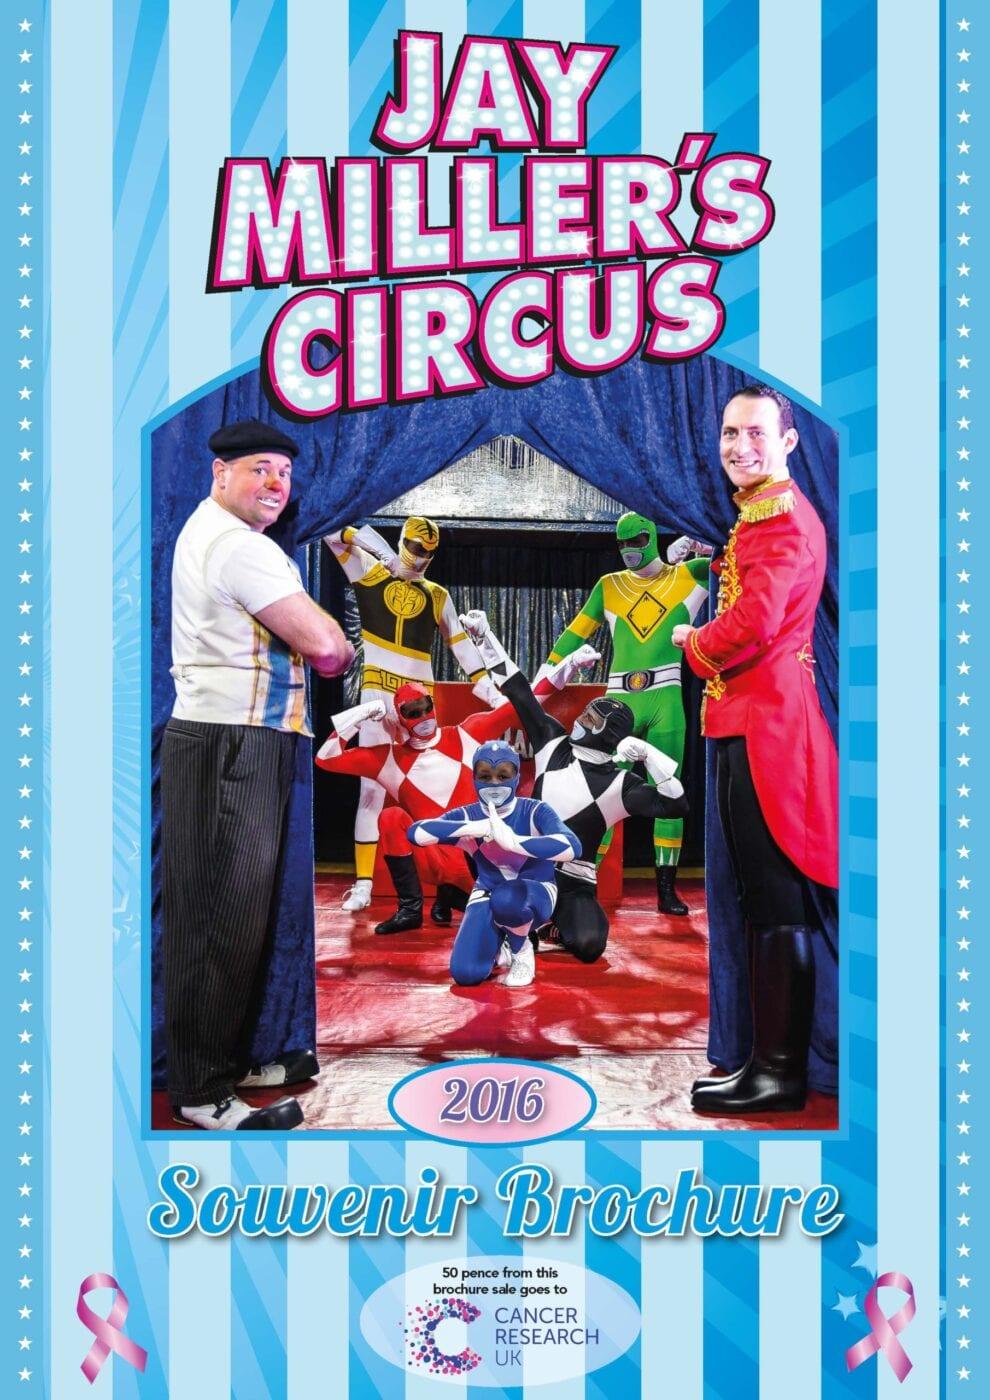 Jay Millers Circus Brochure 2016